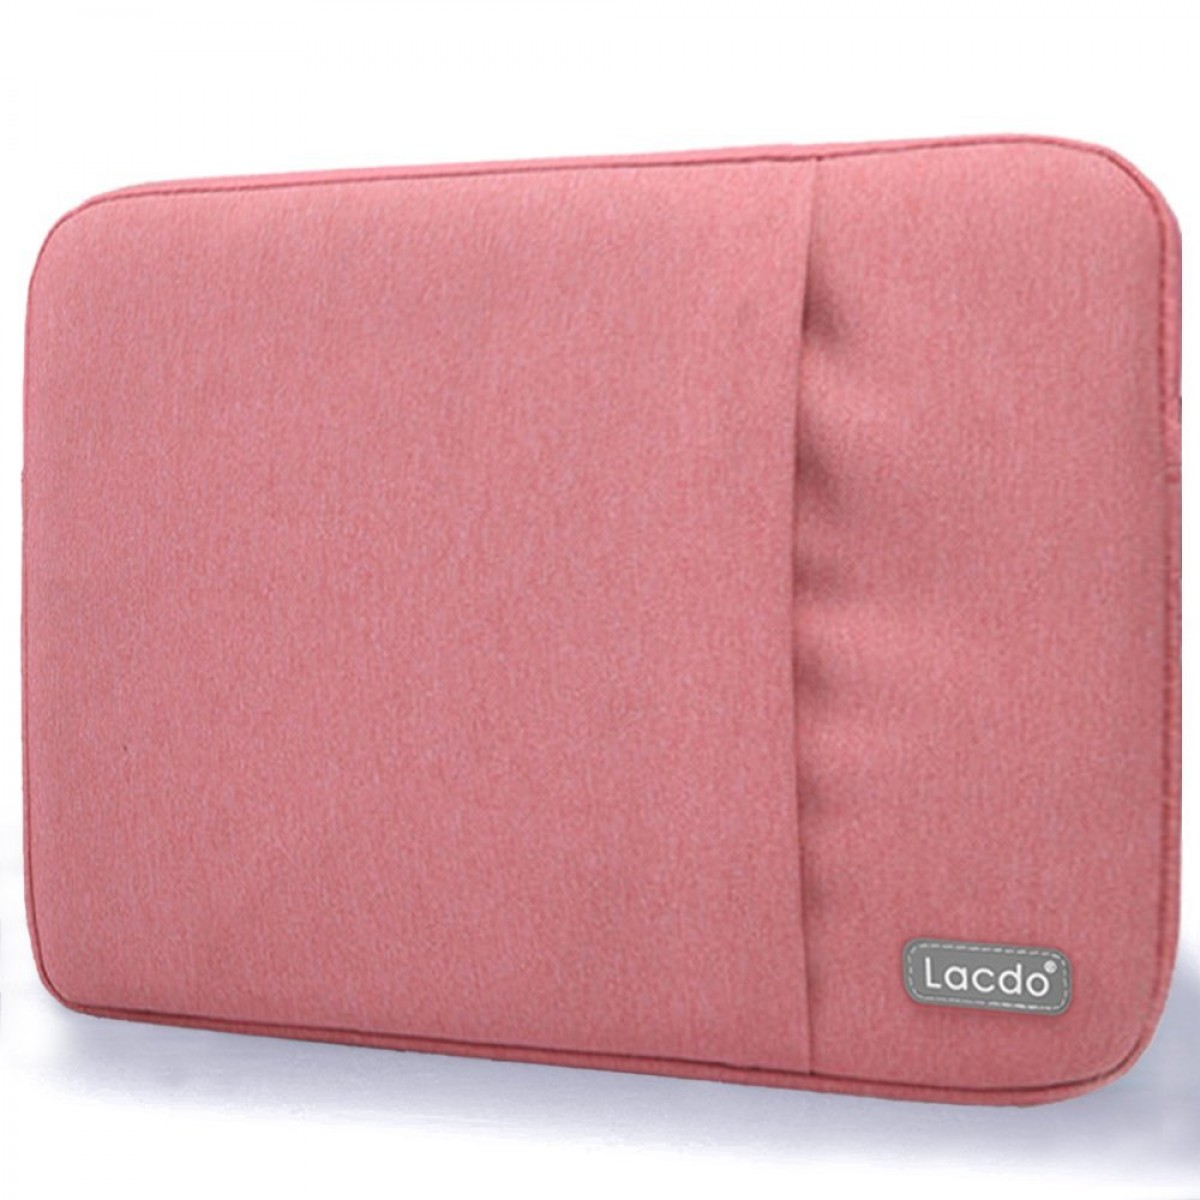 super popular 6b018 9eb77 Lacdo 13-13.3 Inch Waterproof Fabric Laptop Sleeve Case Bag Notebook Bag  Case for Apple MacBook Pro 13.3-inch Retina Display, Macbook Air 13